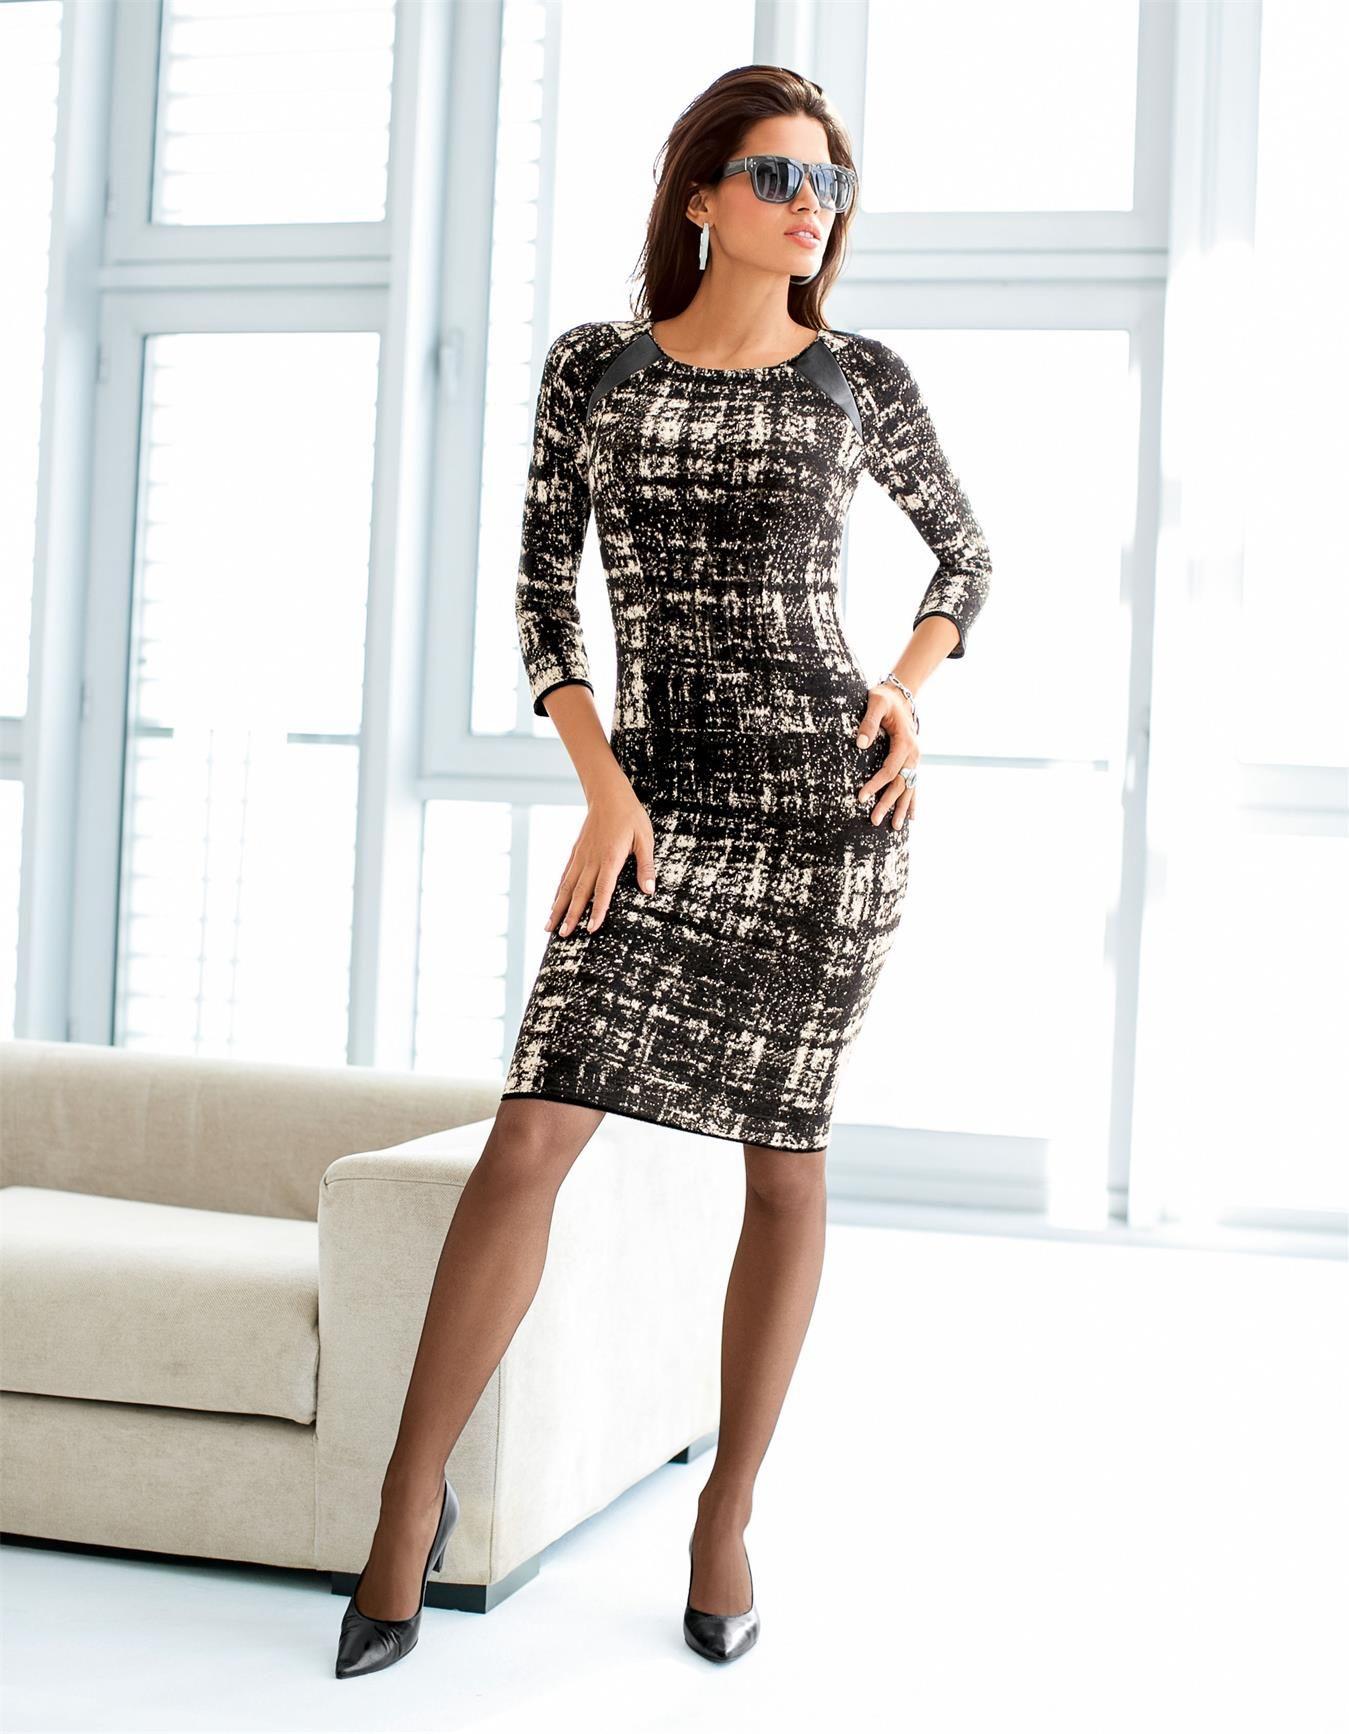 jacquard strickkleid in der farbe schwarz kitt grau. Black Bedroom Furniture Sets. Home Design Ideas